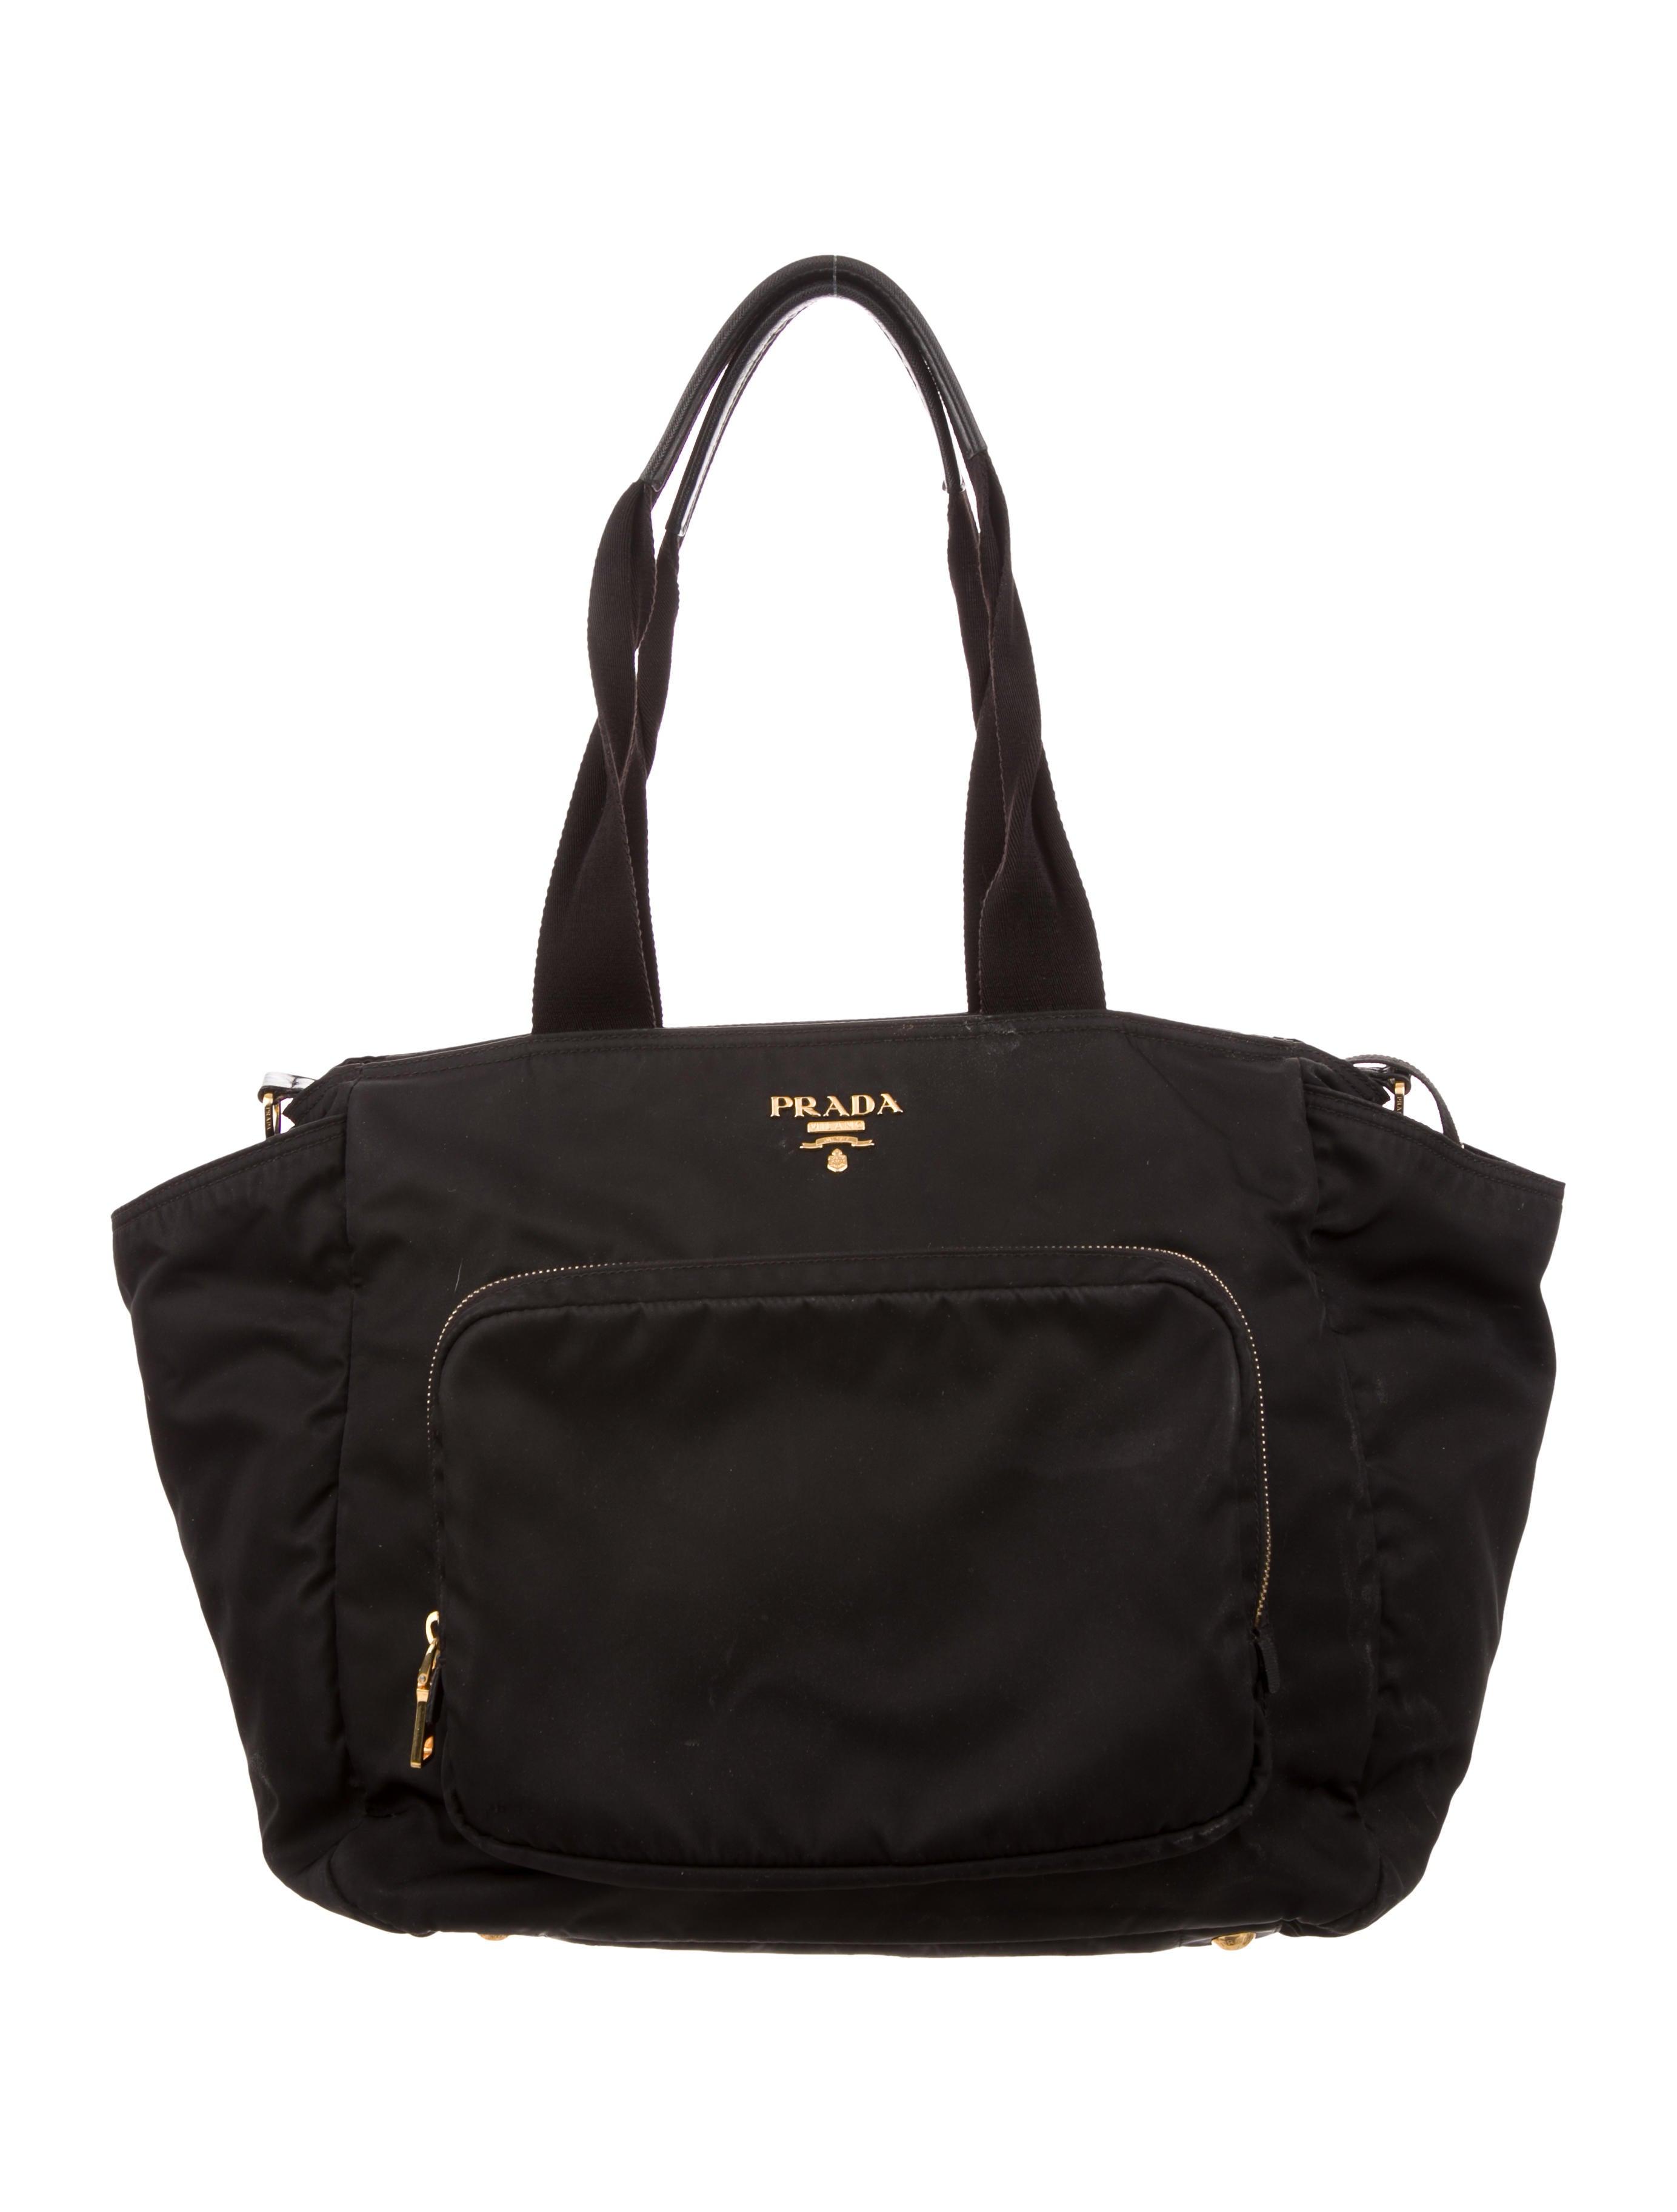 eb4764cd9072 cheap prada nylon diaper bag lyst 4bb5f 9b443; uk prada tessuto diaper bag  handbags pra253511 the realreal 89225 78e0c